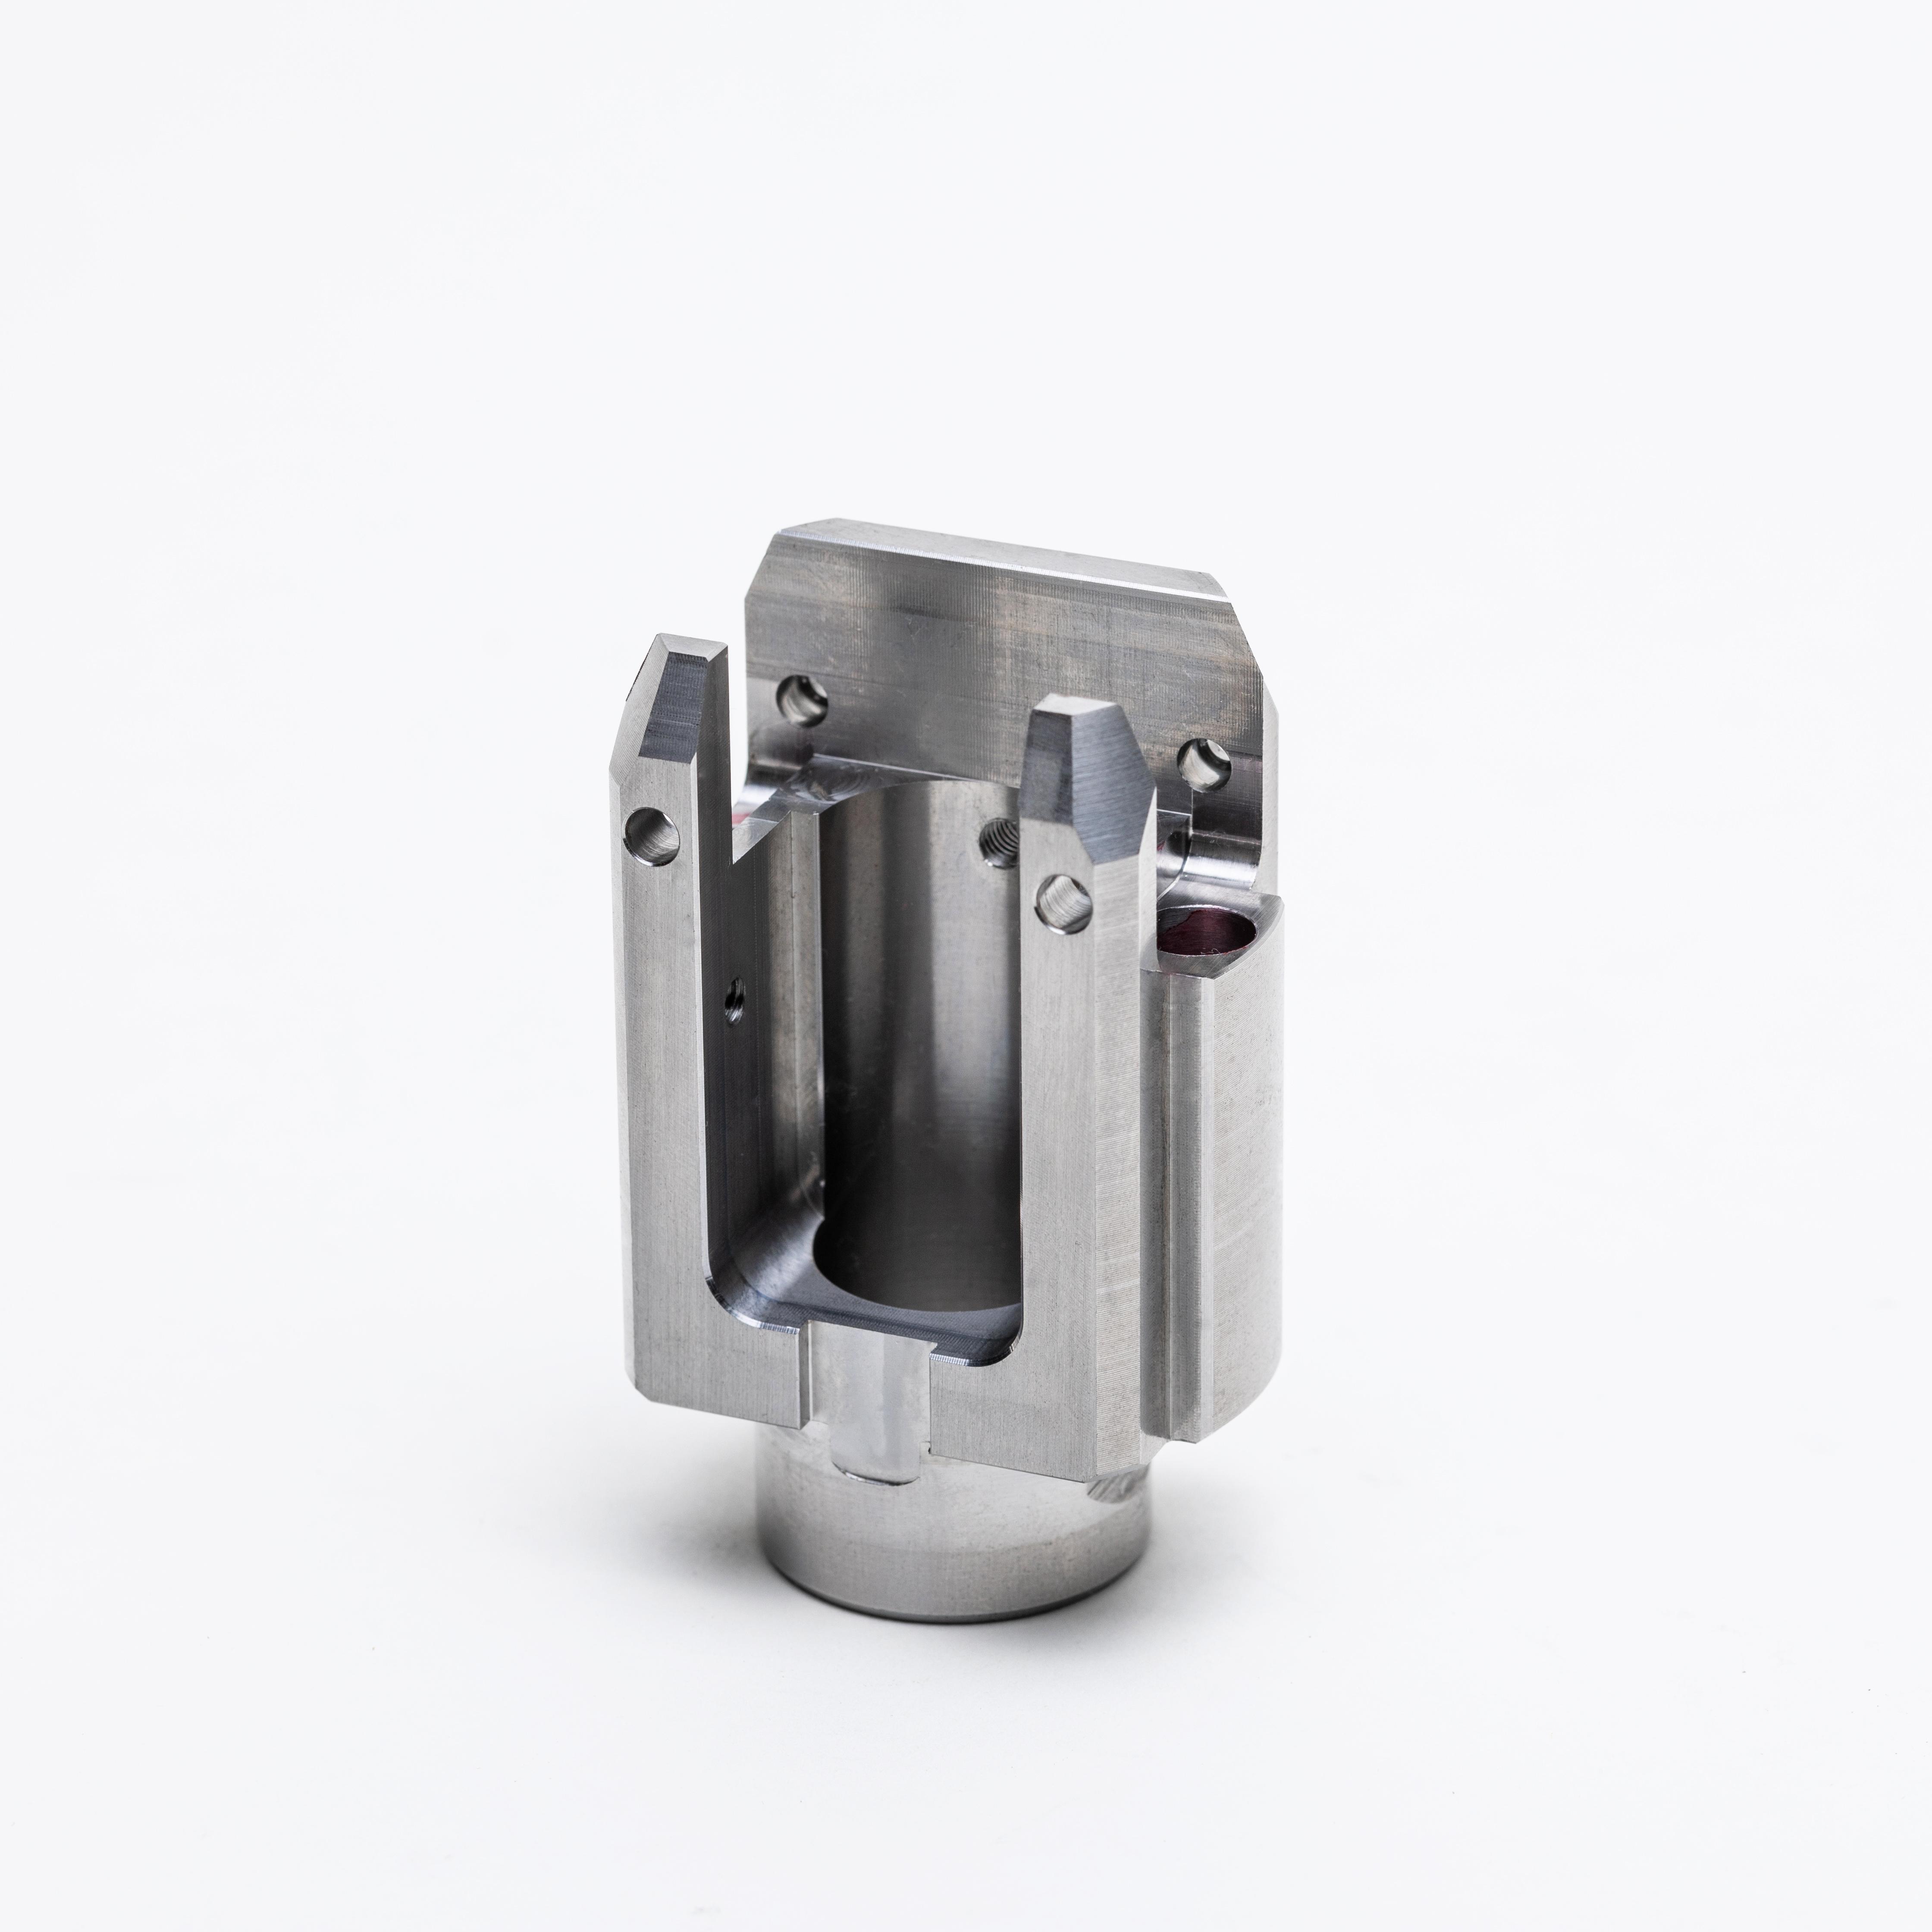 hofmann cnc technik traunstein robotik